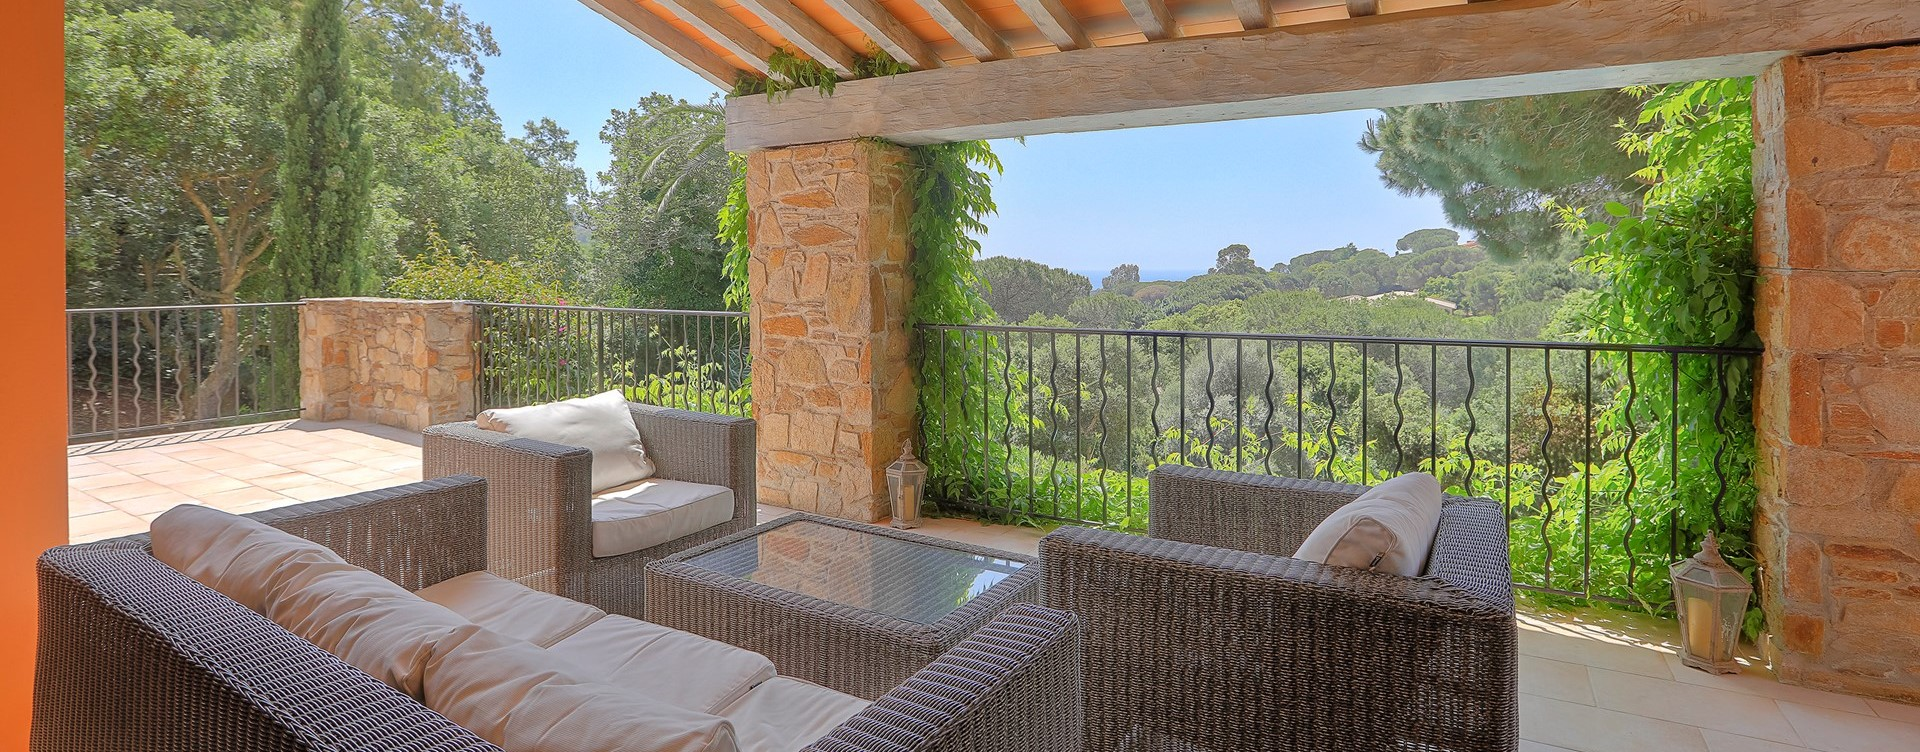 luxury-3-bedroom-villa-south-of-france